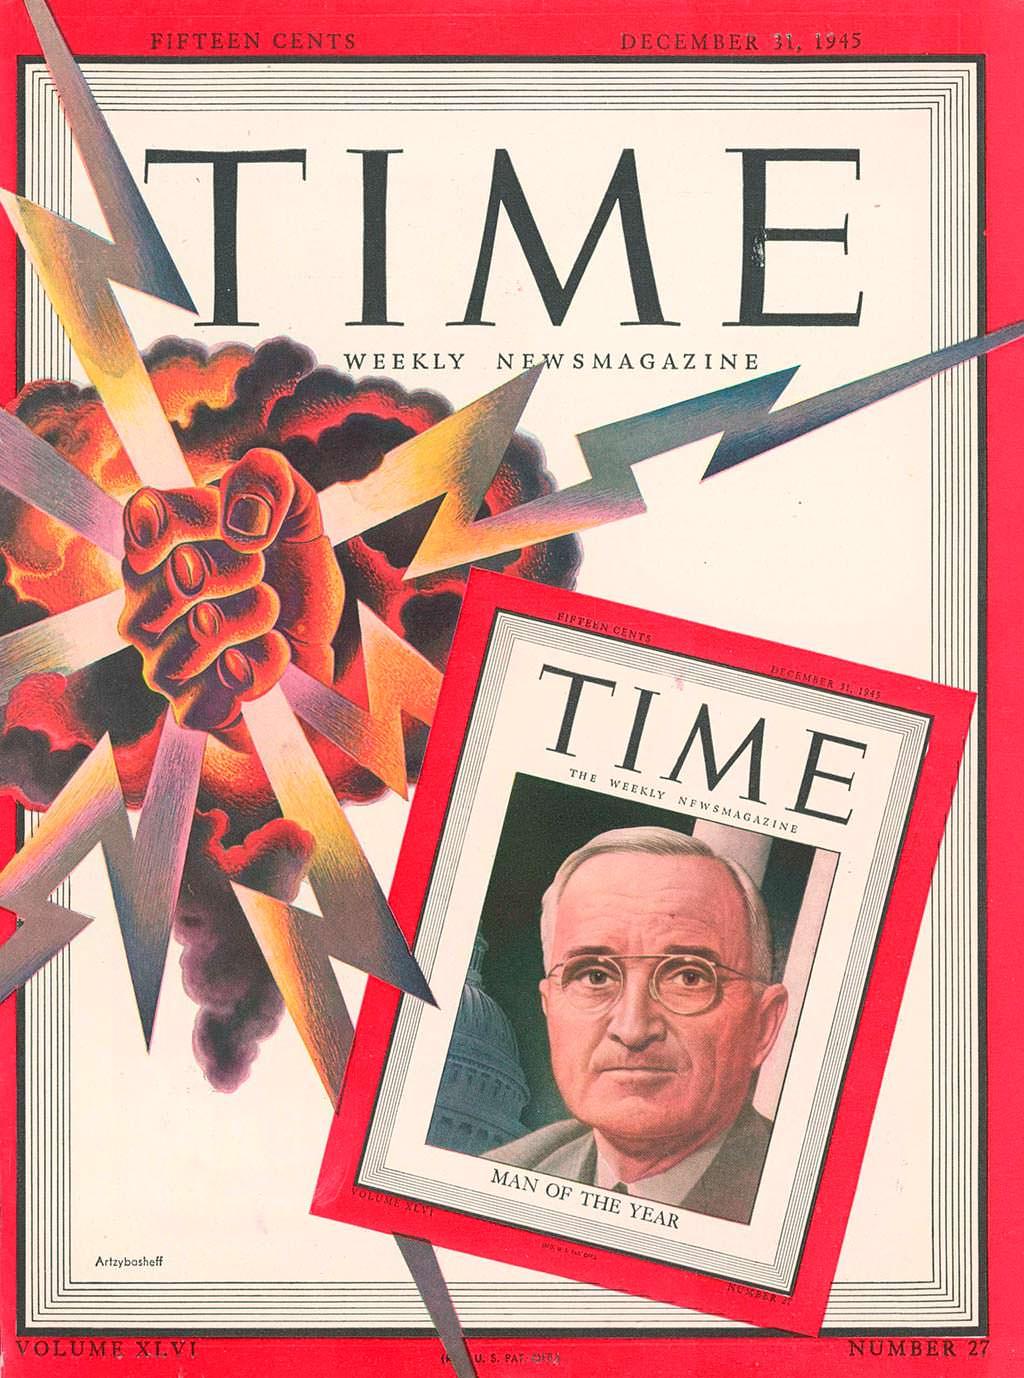 1945 год. Президент США Гарри Трумэн на обложке Time